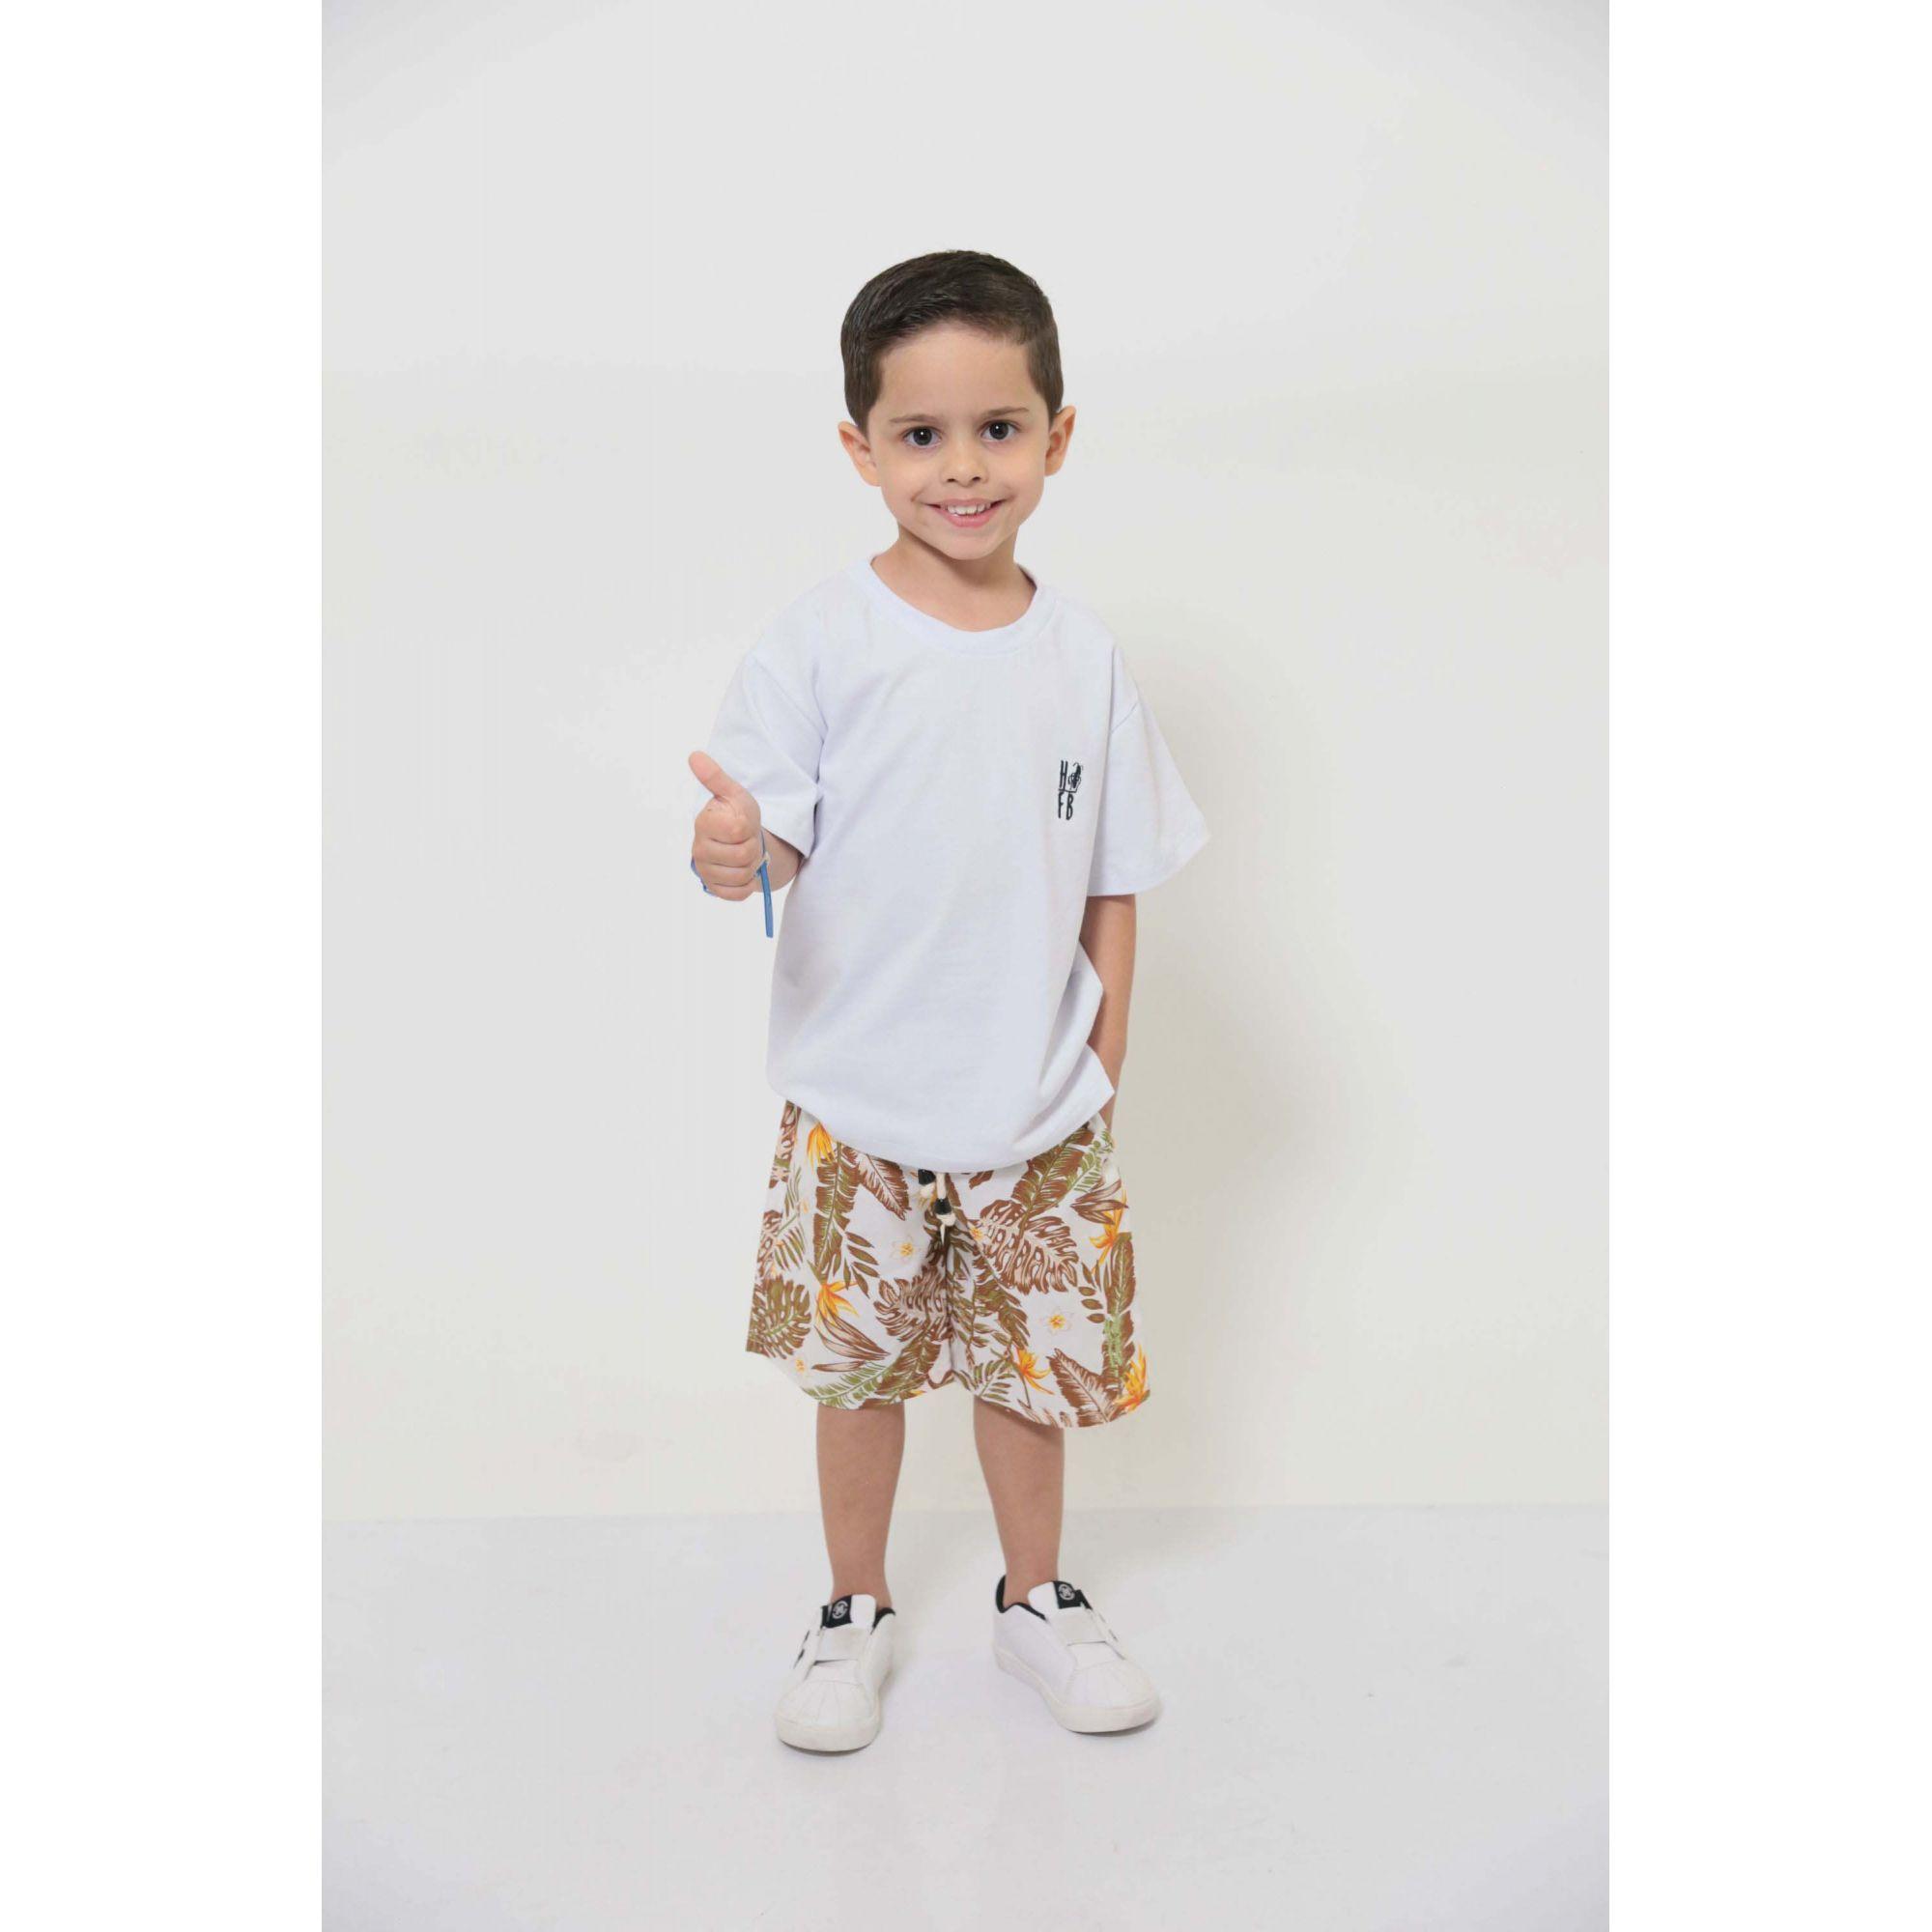 PAI E FILHO > 02 T-Shirts - Branca  [Coleção Tal Pai Tal Filho]  - Heitor Fashion Brazil